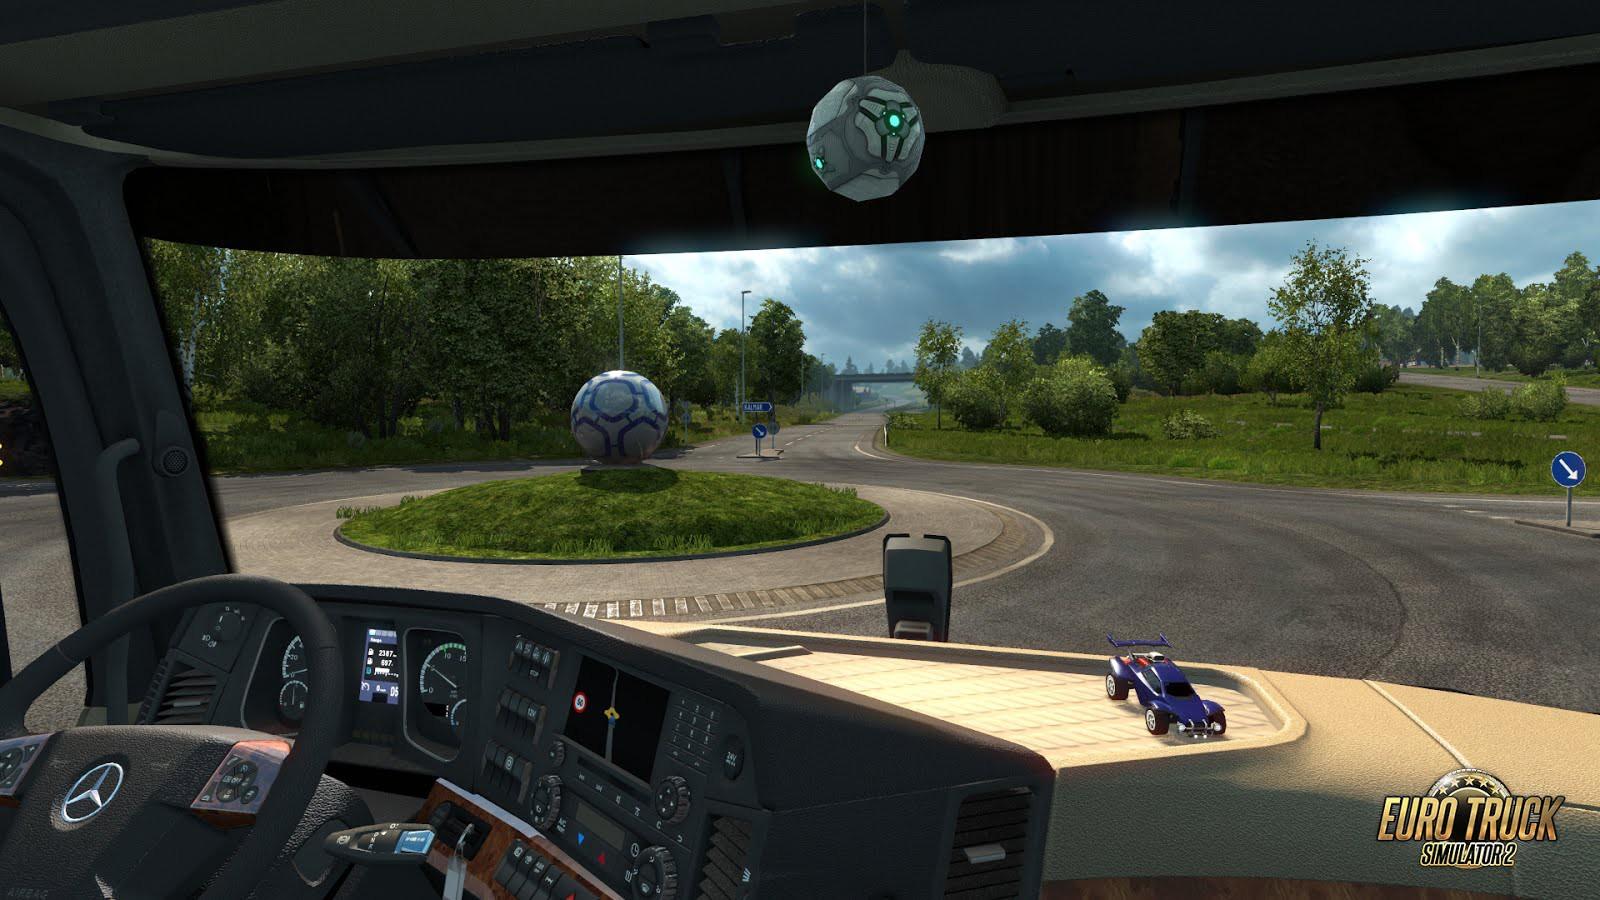 Spolupráce mezi hrami Rocket League a Euro Truck Simulator 2 122668